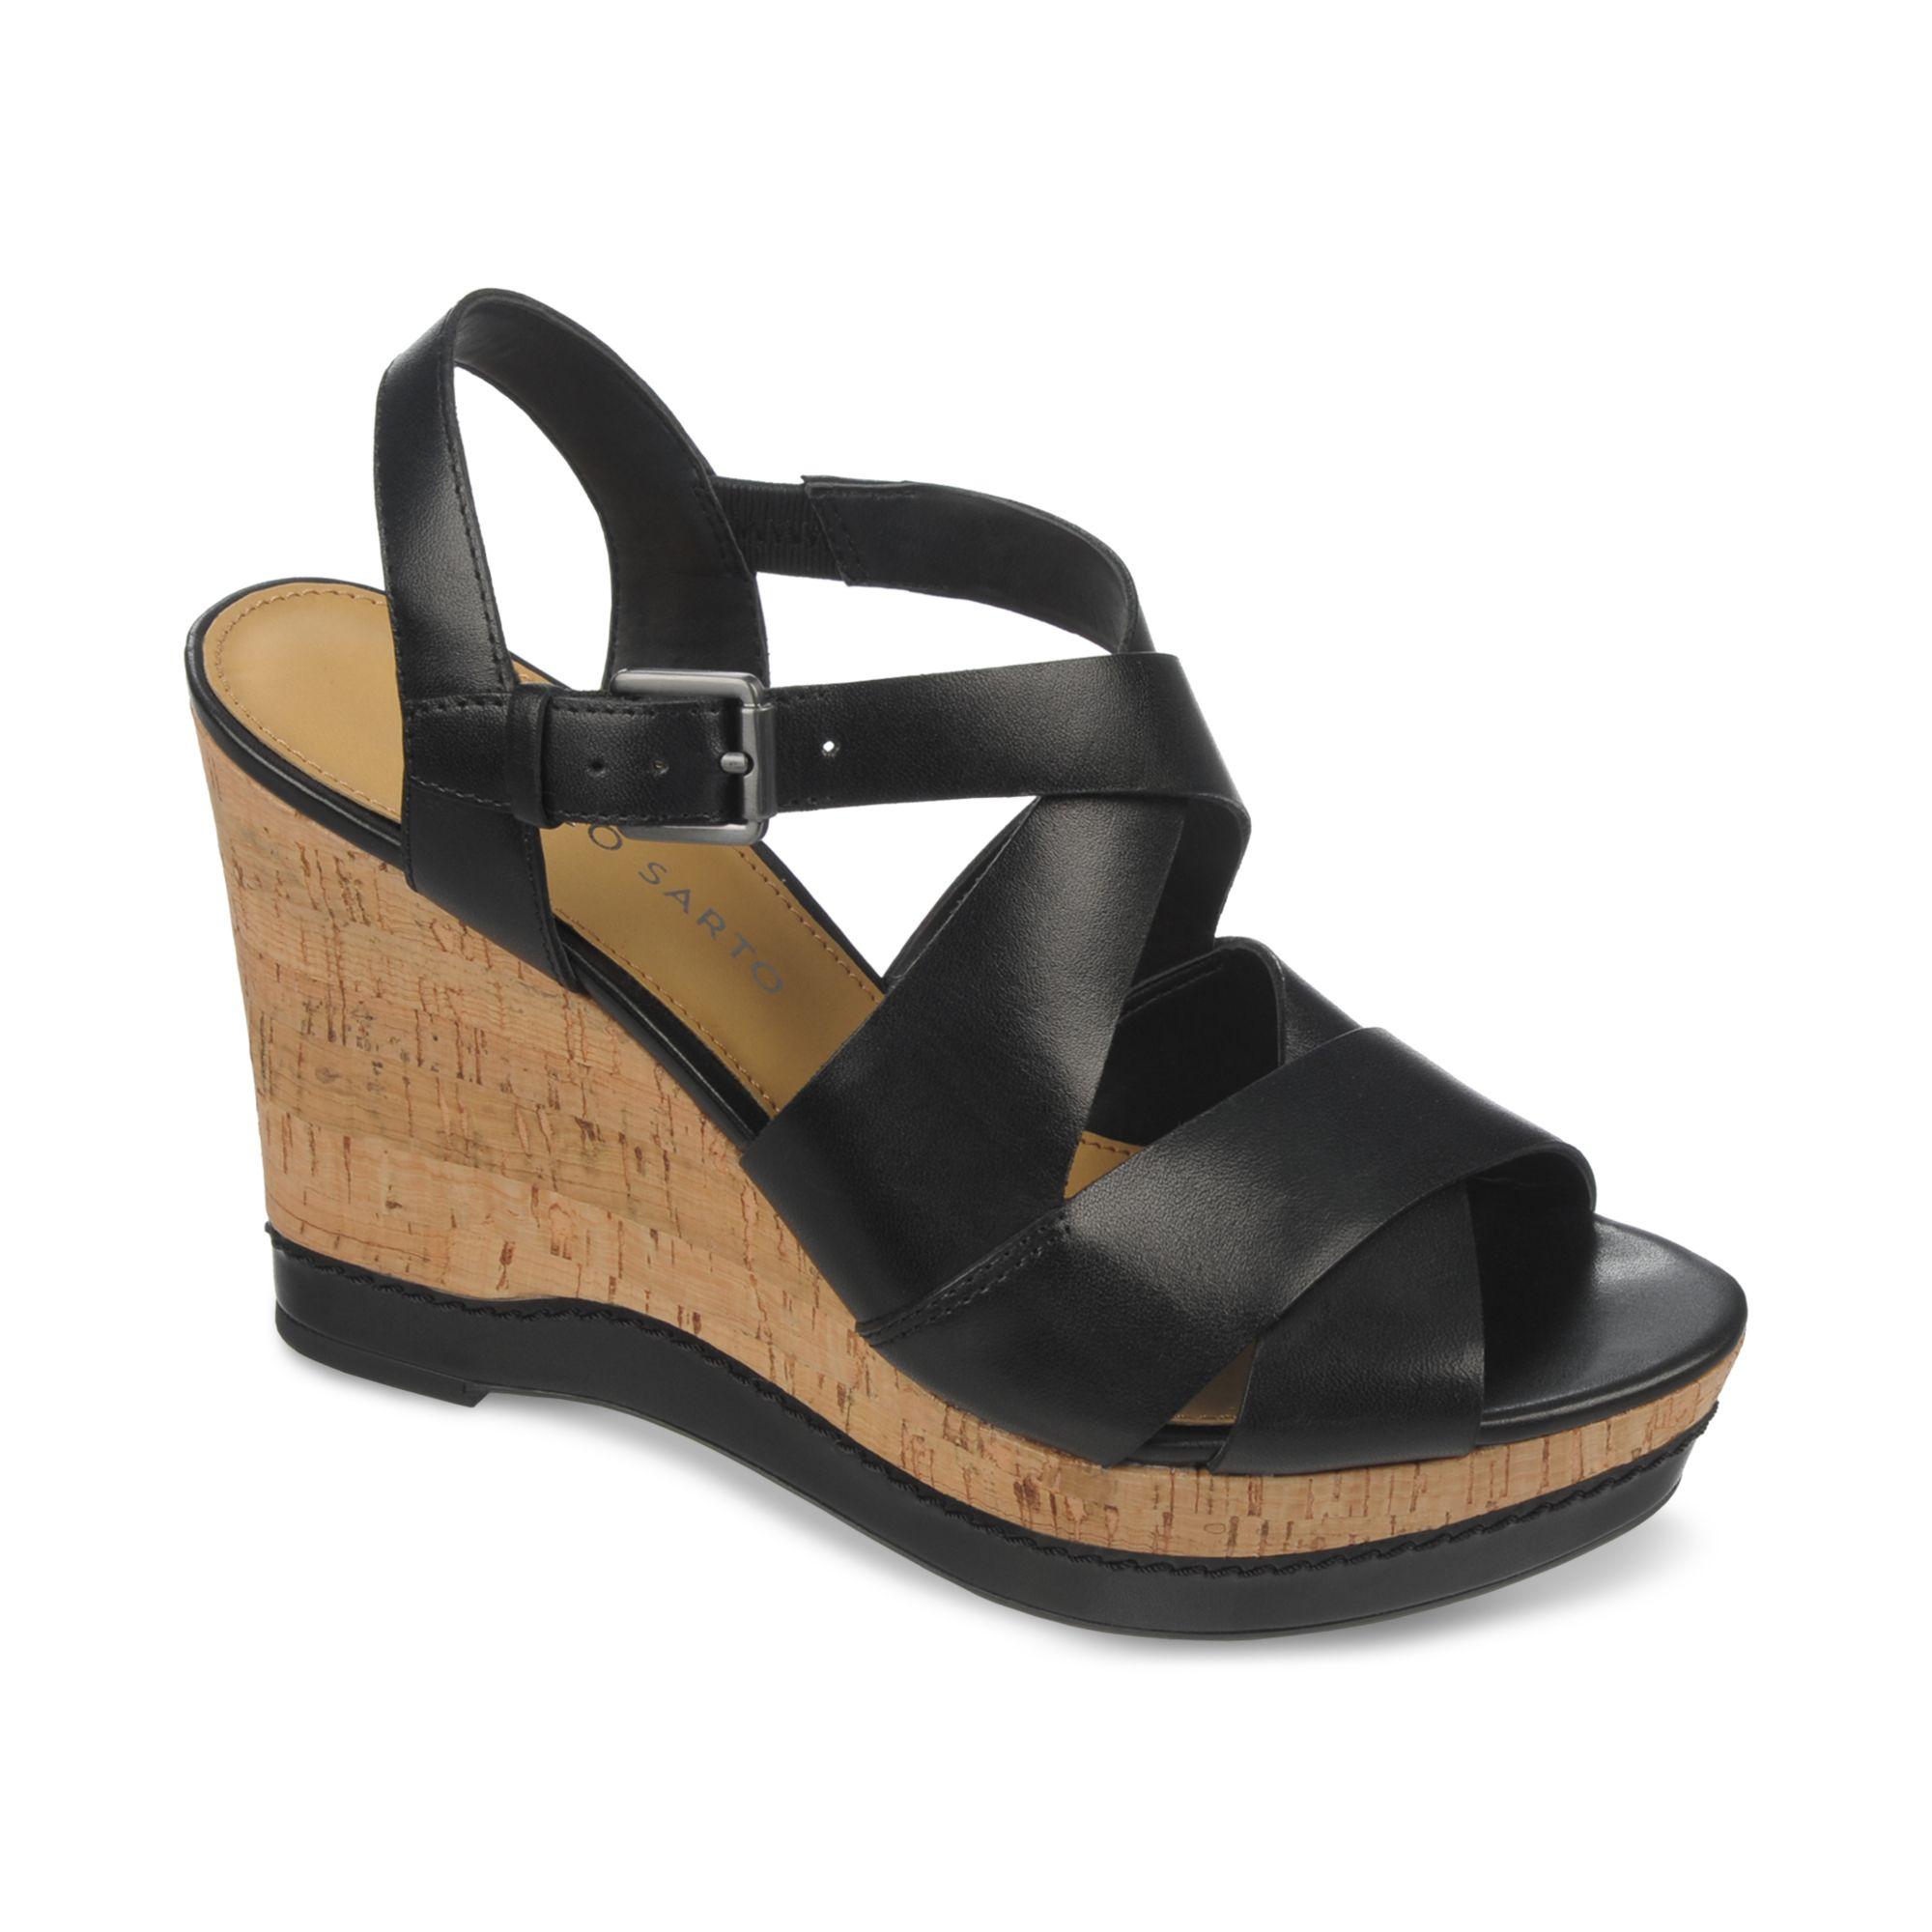 franco sarto shiver platform wedge sandals in black lyst